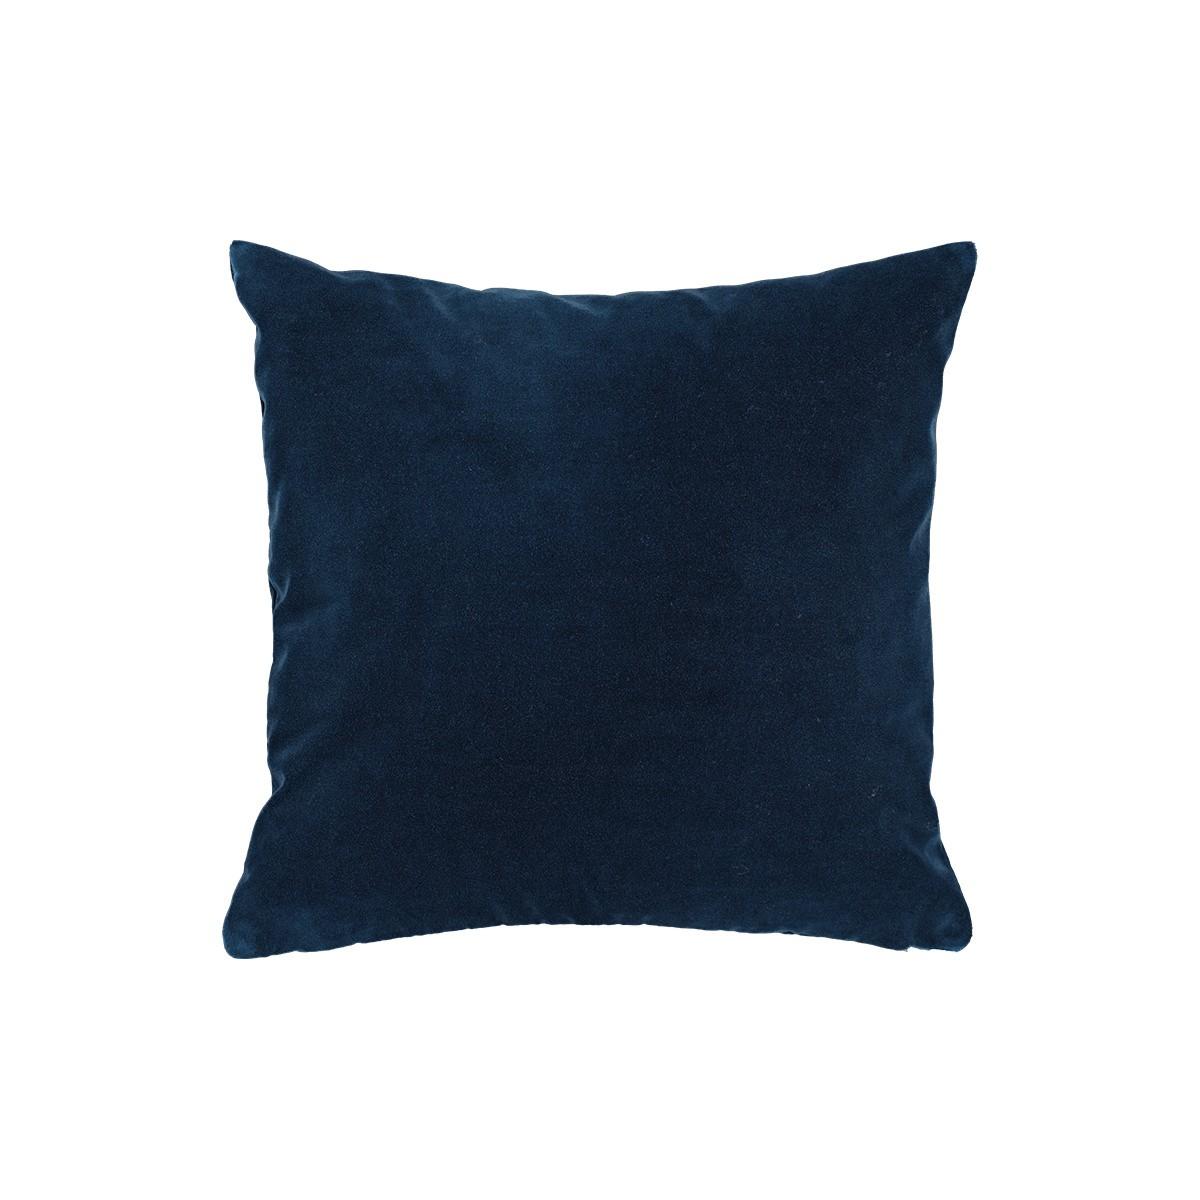 Coussin Rotondo velours bleu nuit